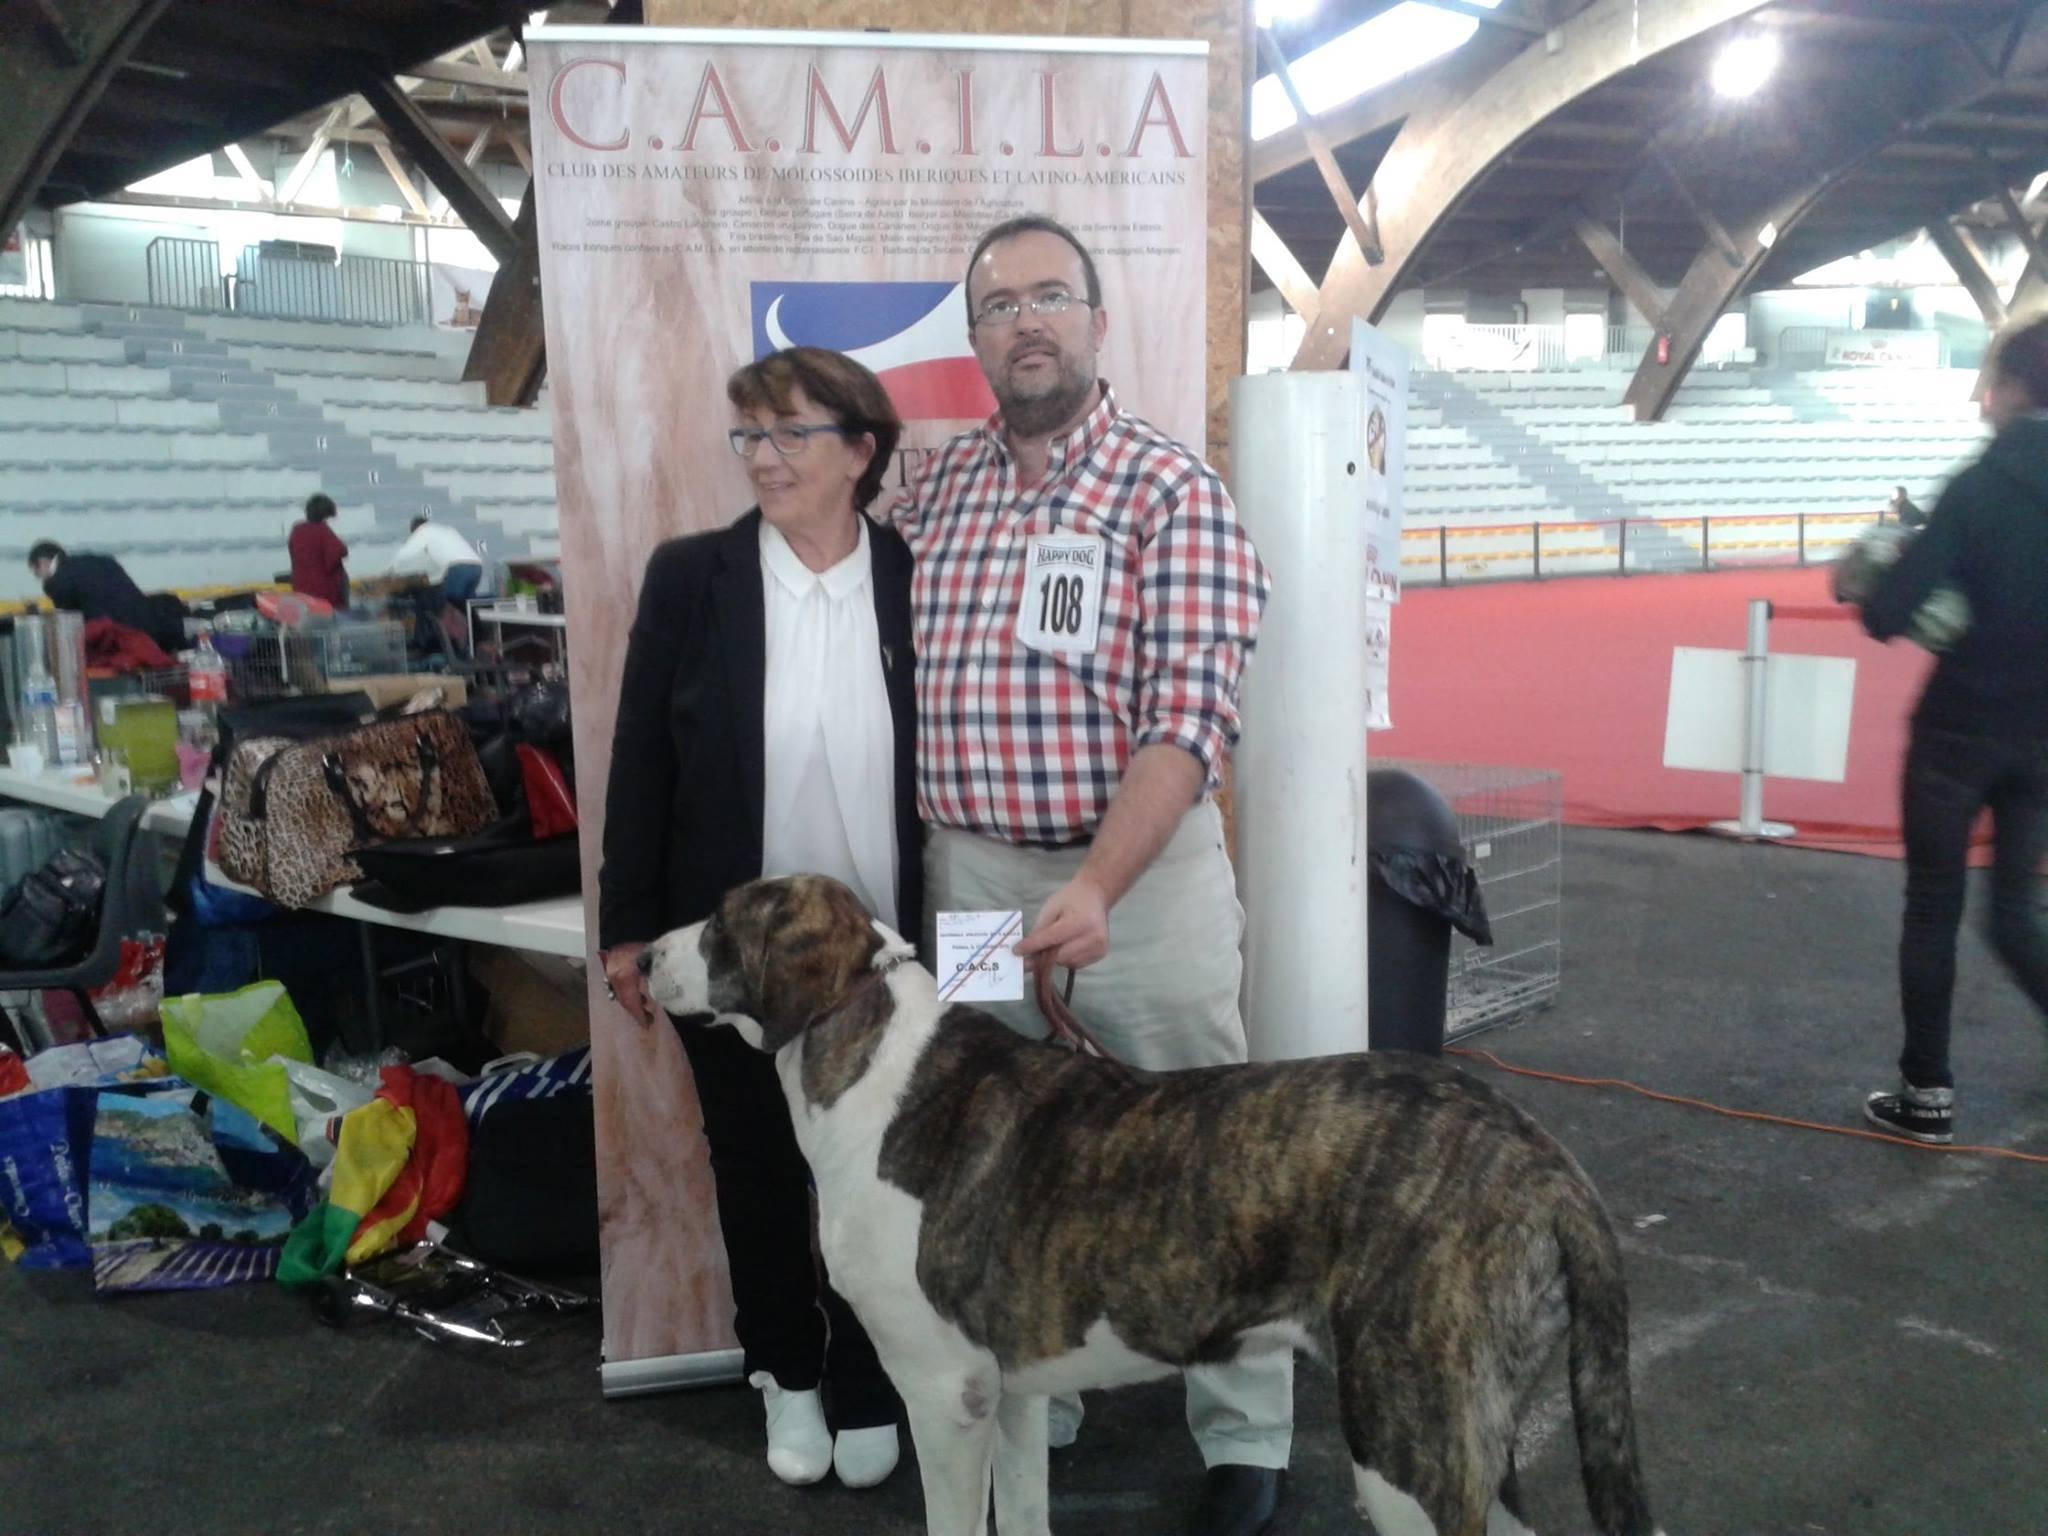 CAMILA Annual Championship Show 2015